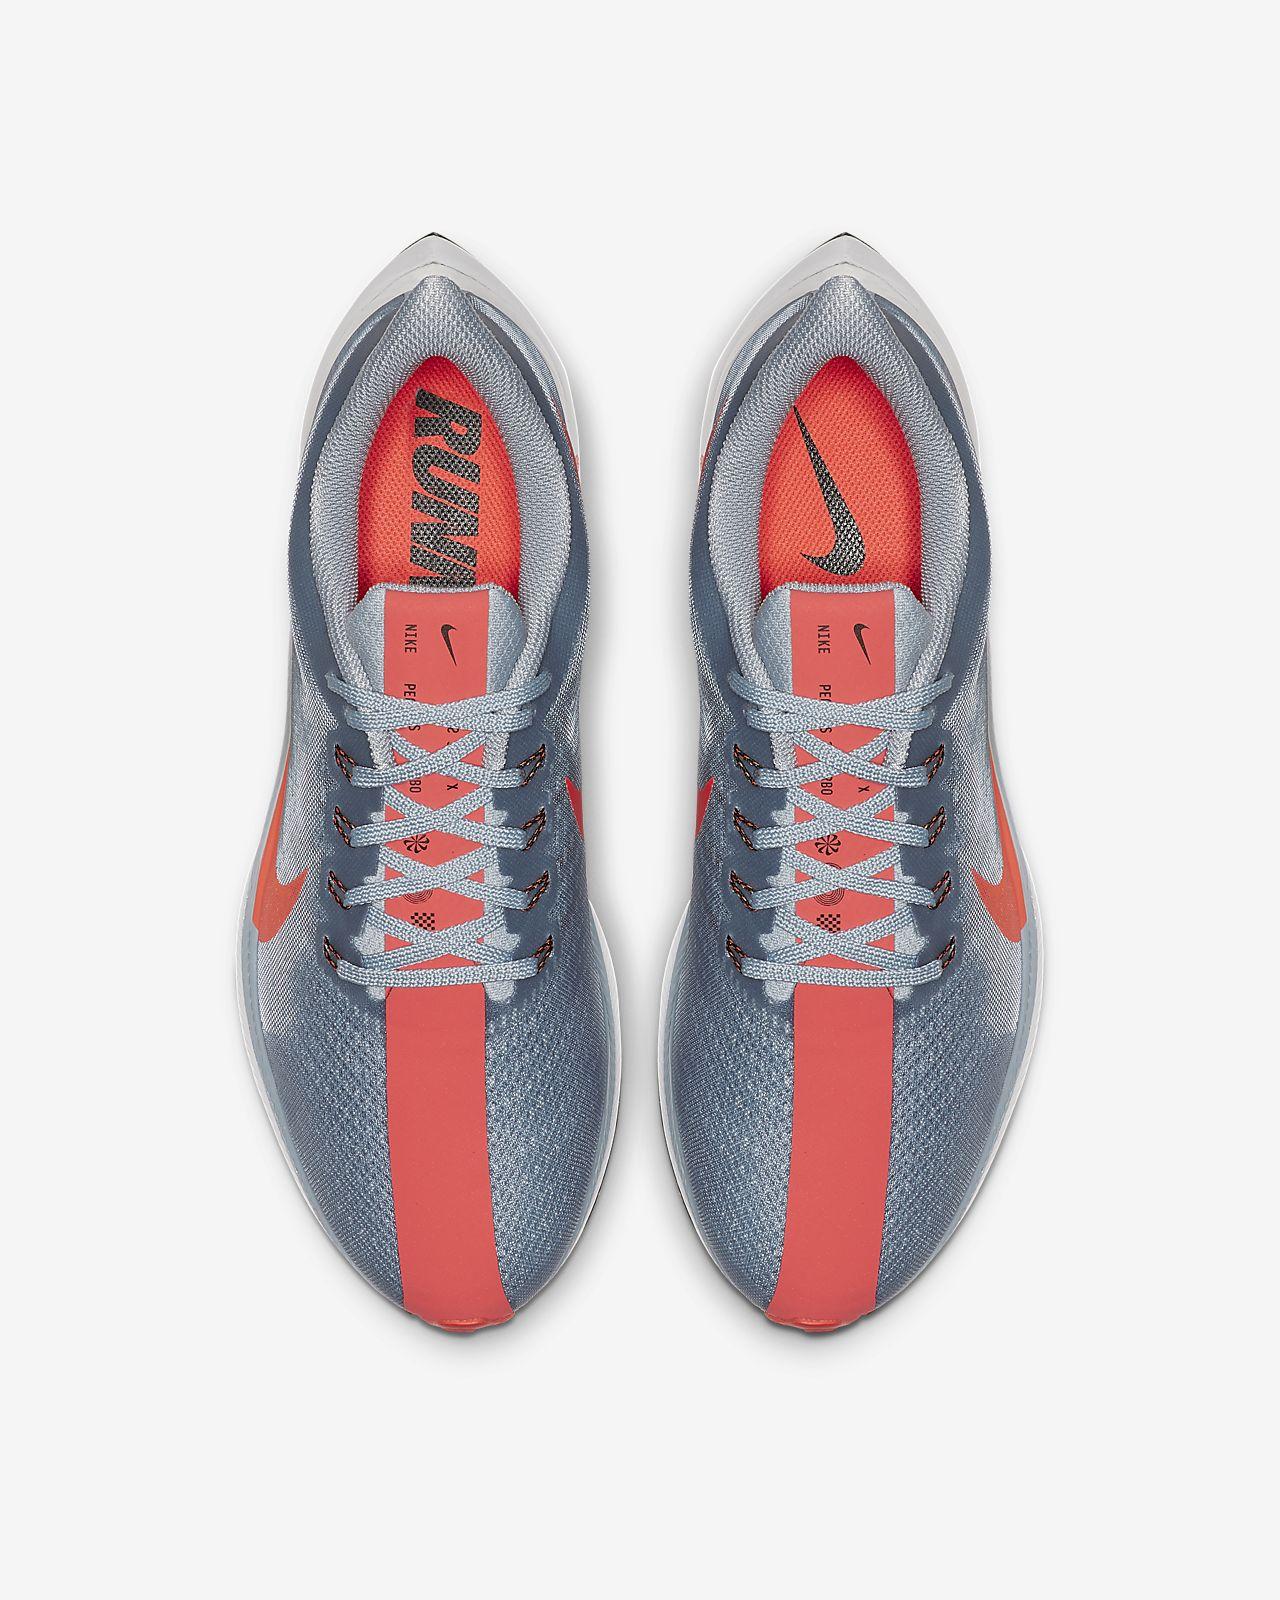 buy cheap 7f0de b46c0 ... Chaussure de running Nike Zoom Pegasus Turbo pour Homme